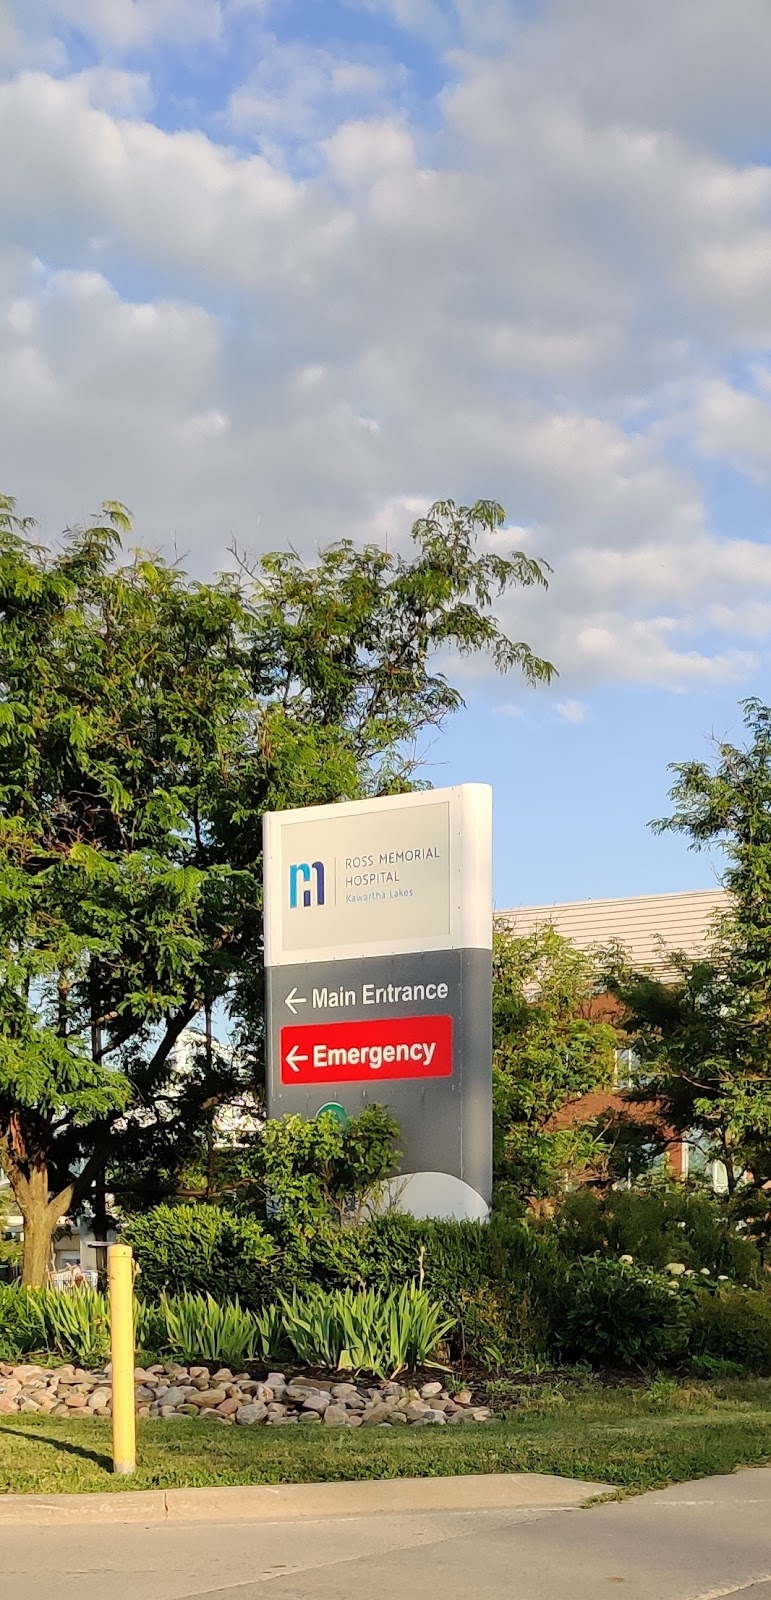 Ross Memorial Hospital | health | 10 Angeline St N, Lindsay, ON K9V 4M8, Canada | 7053246111 OR +1 705-324-6111